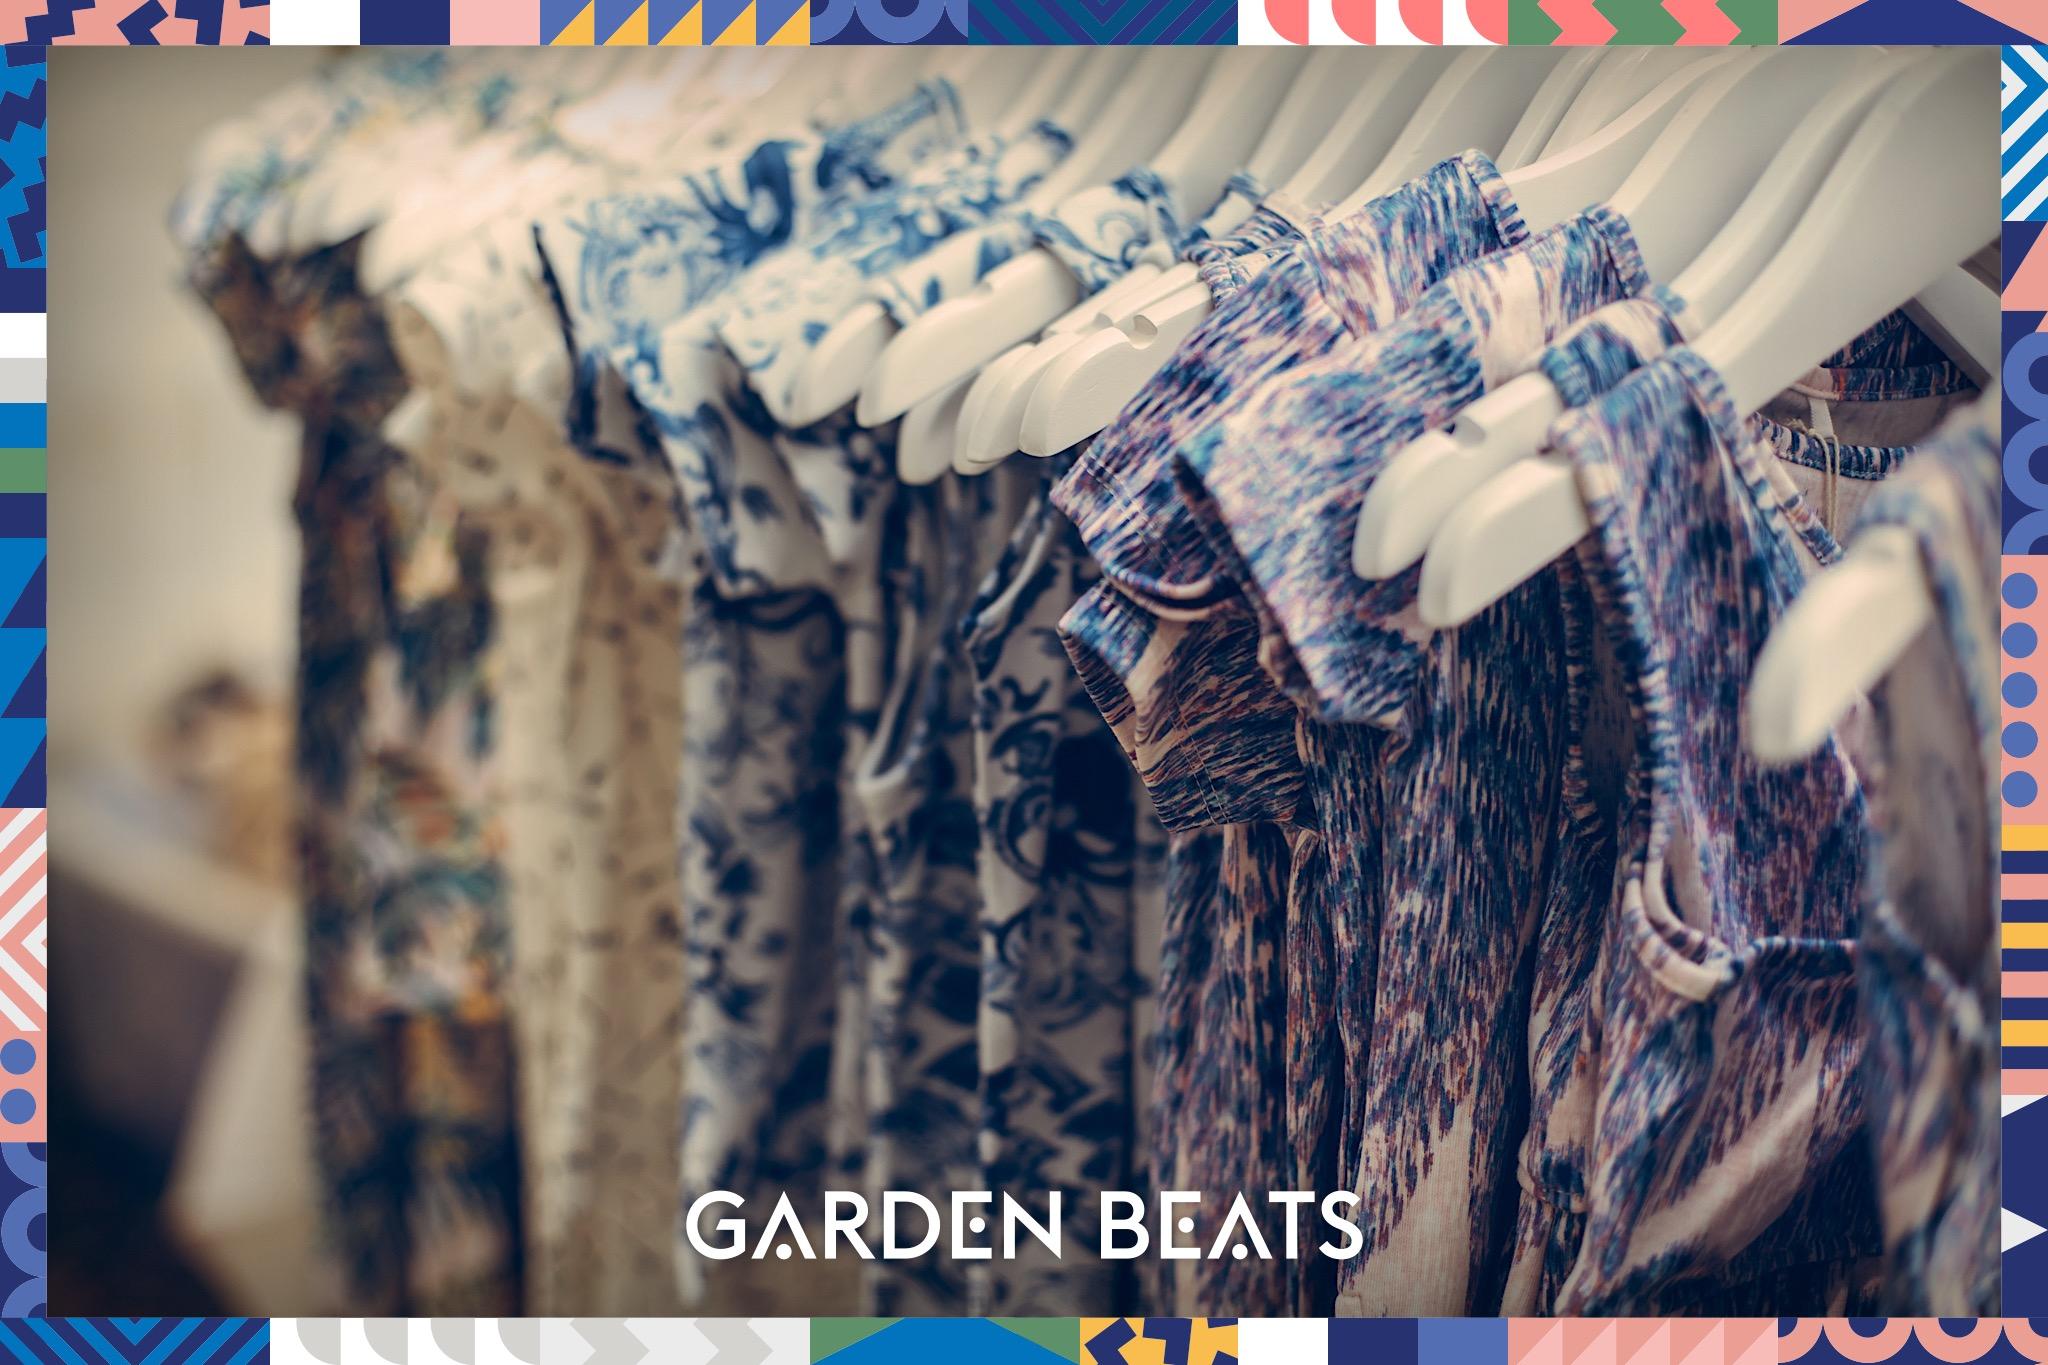 03032018_GardenBeats_Colossal124_Watermarked.jpg